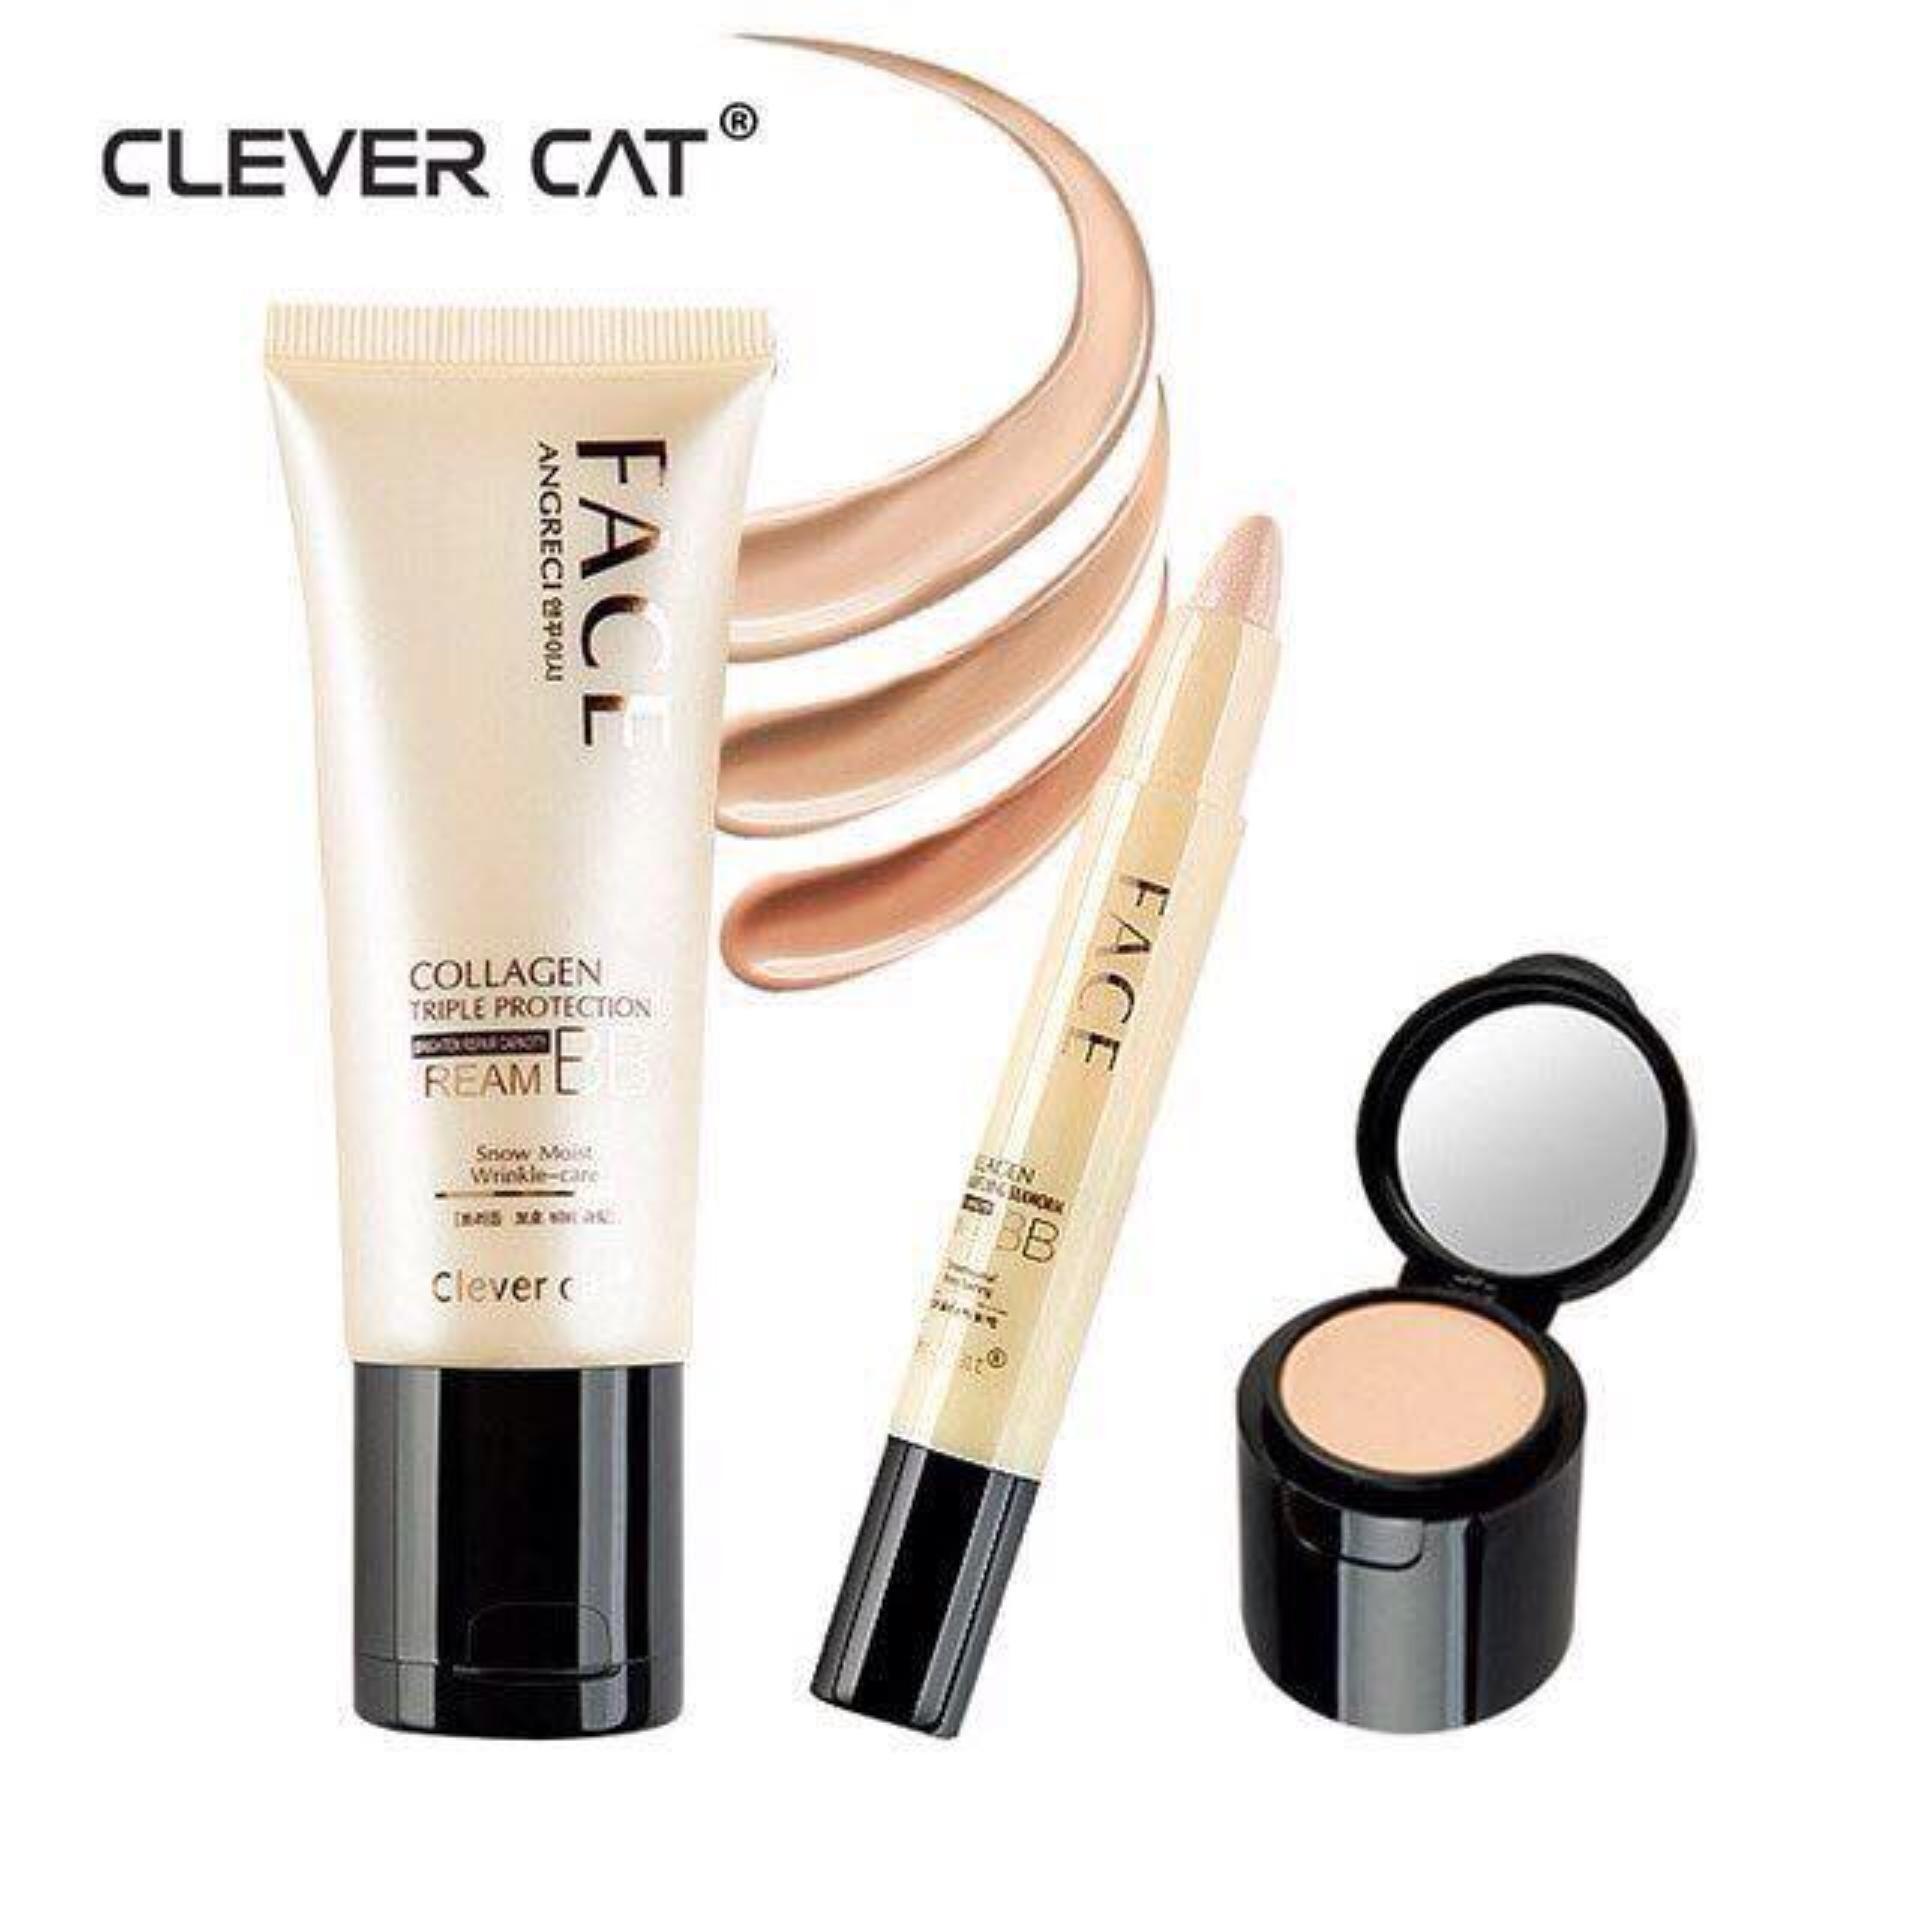 KEM NỀN CHE KHUYẾT ĐIỂM 2IN1 CLEVER CAT